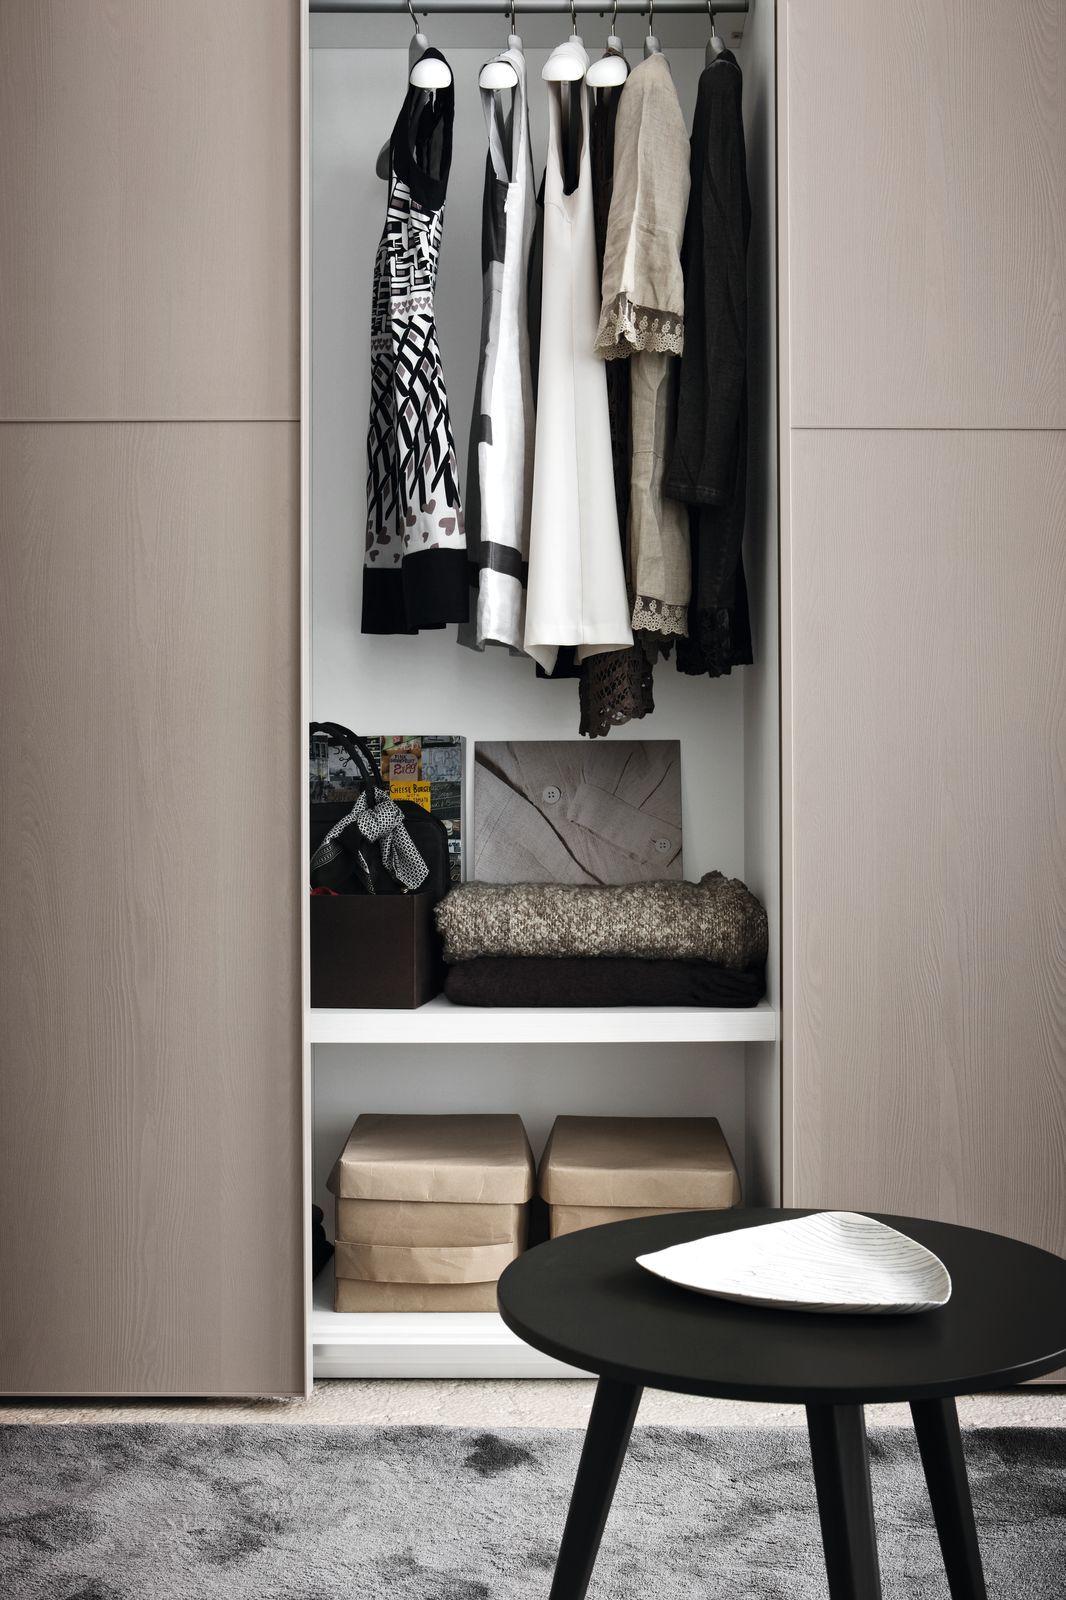 Italian made bedroom furniture by Novamobili, designed to